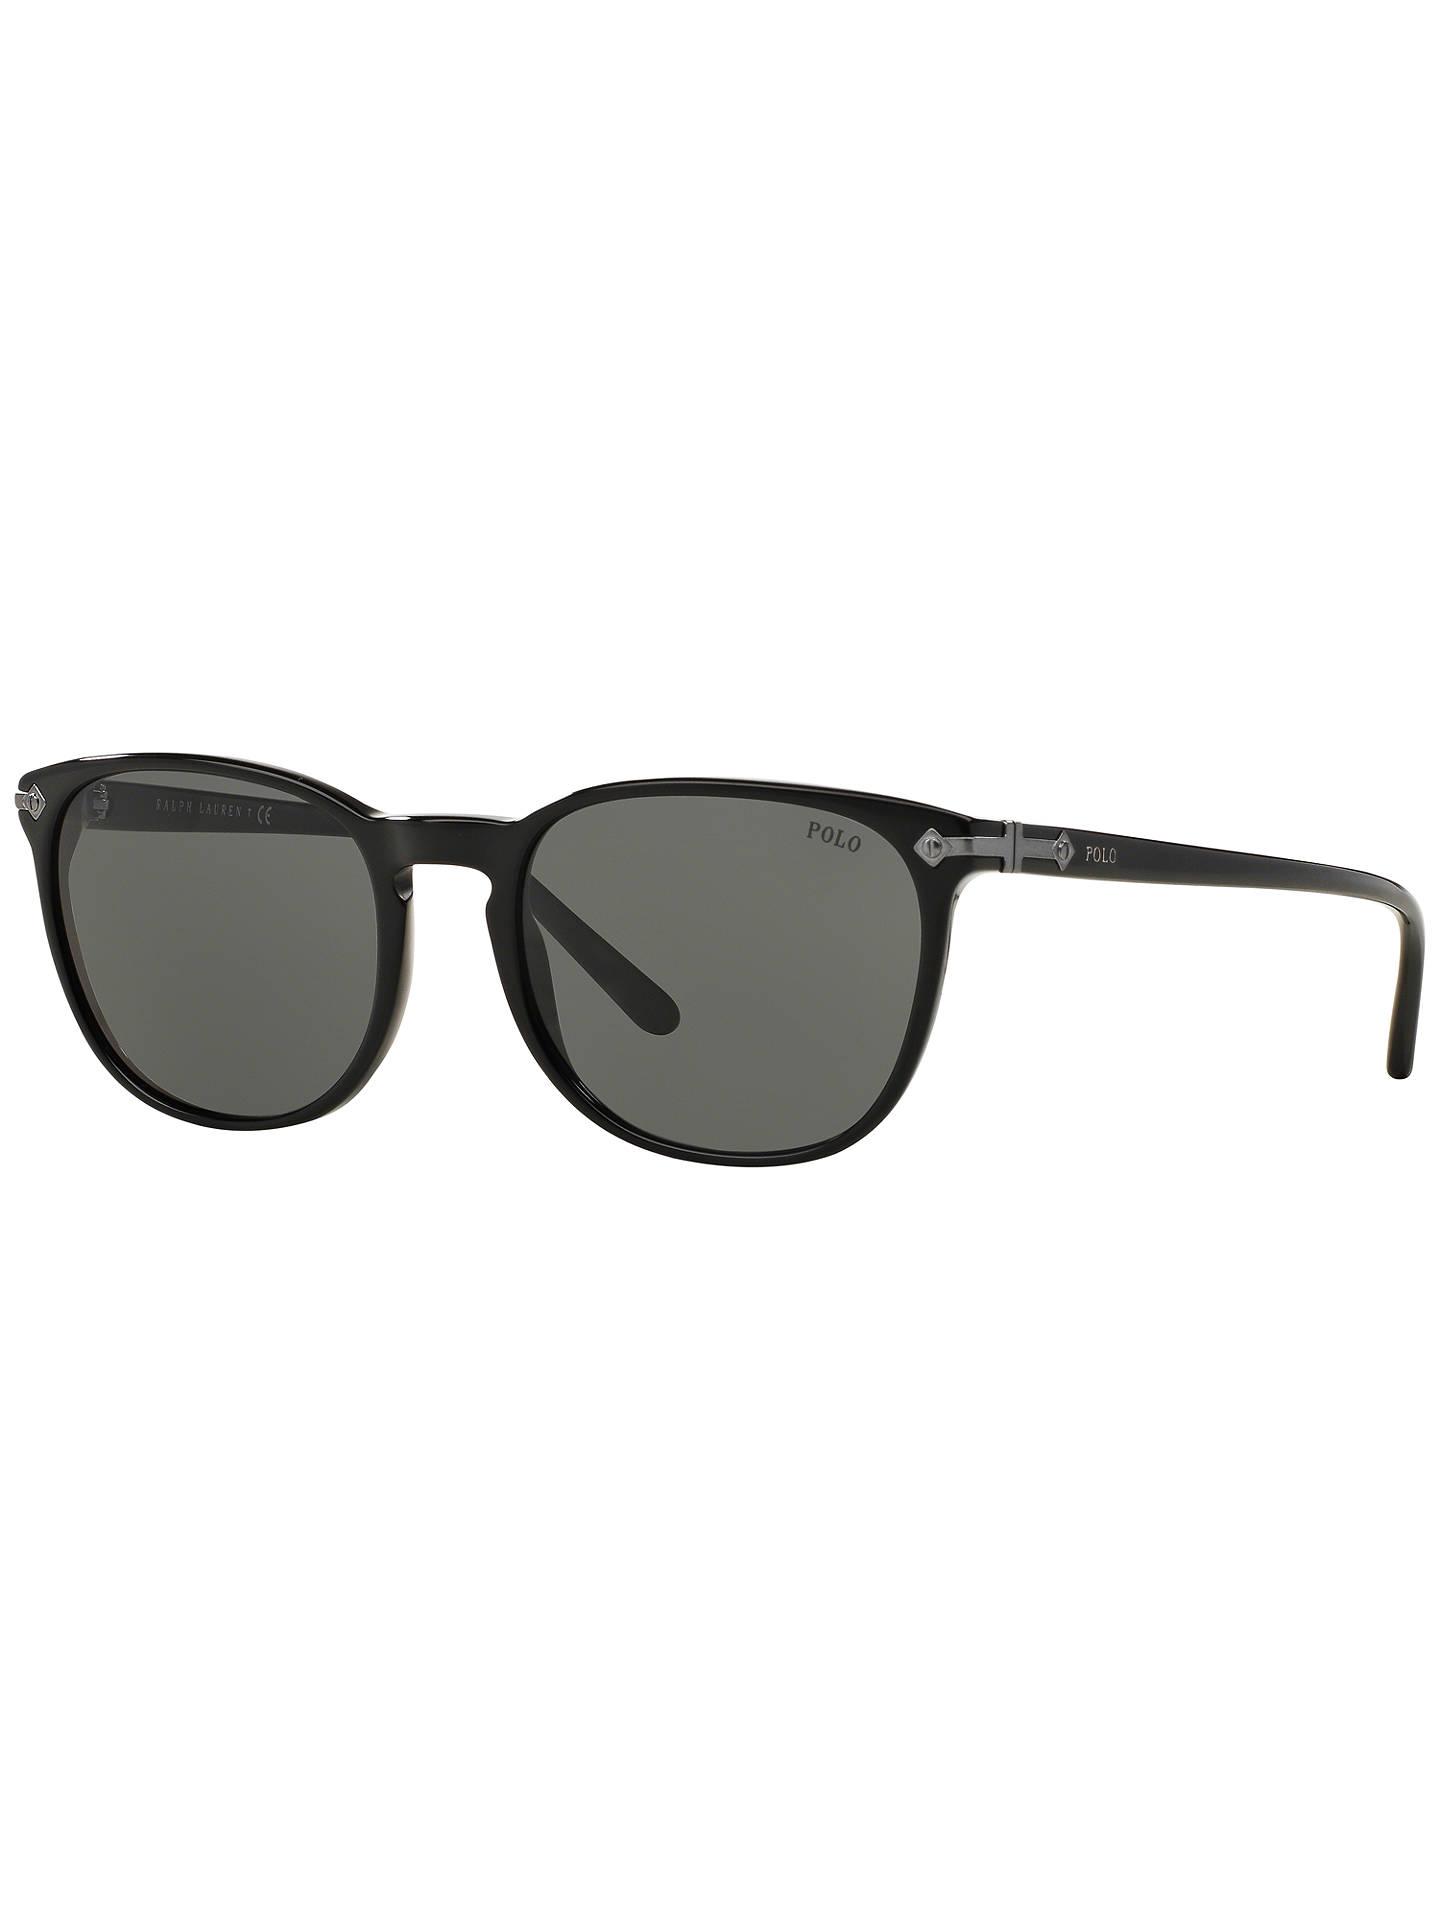 2247d9774060 Buy Polo Ralph Lauren PH4107 Phantos Oval Sunglasses, Black Online at  johnlewis.com ...